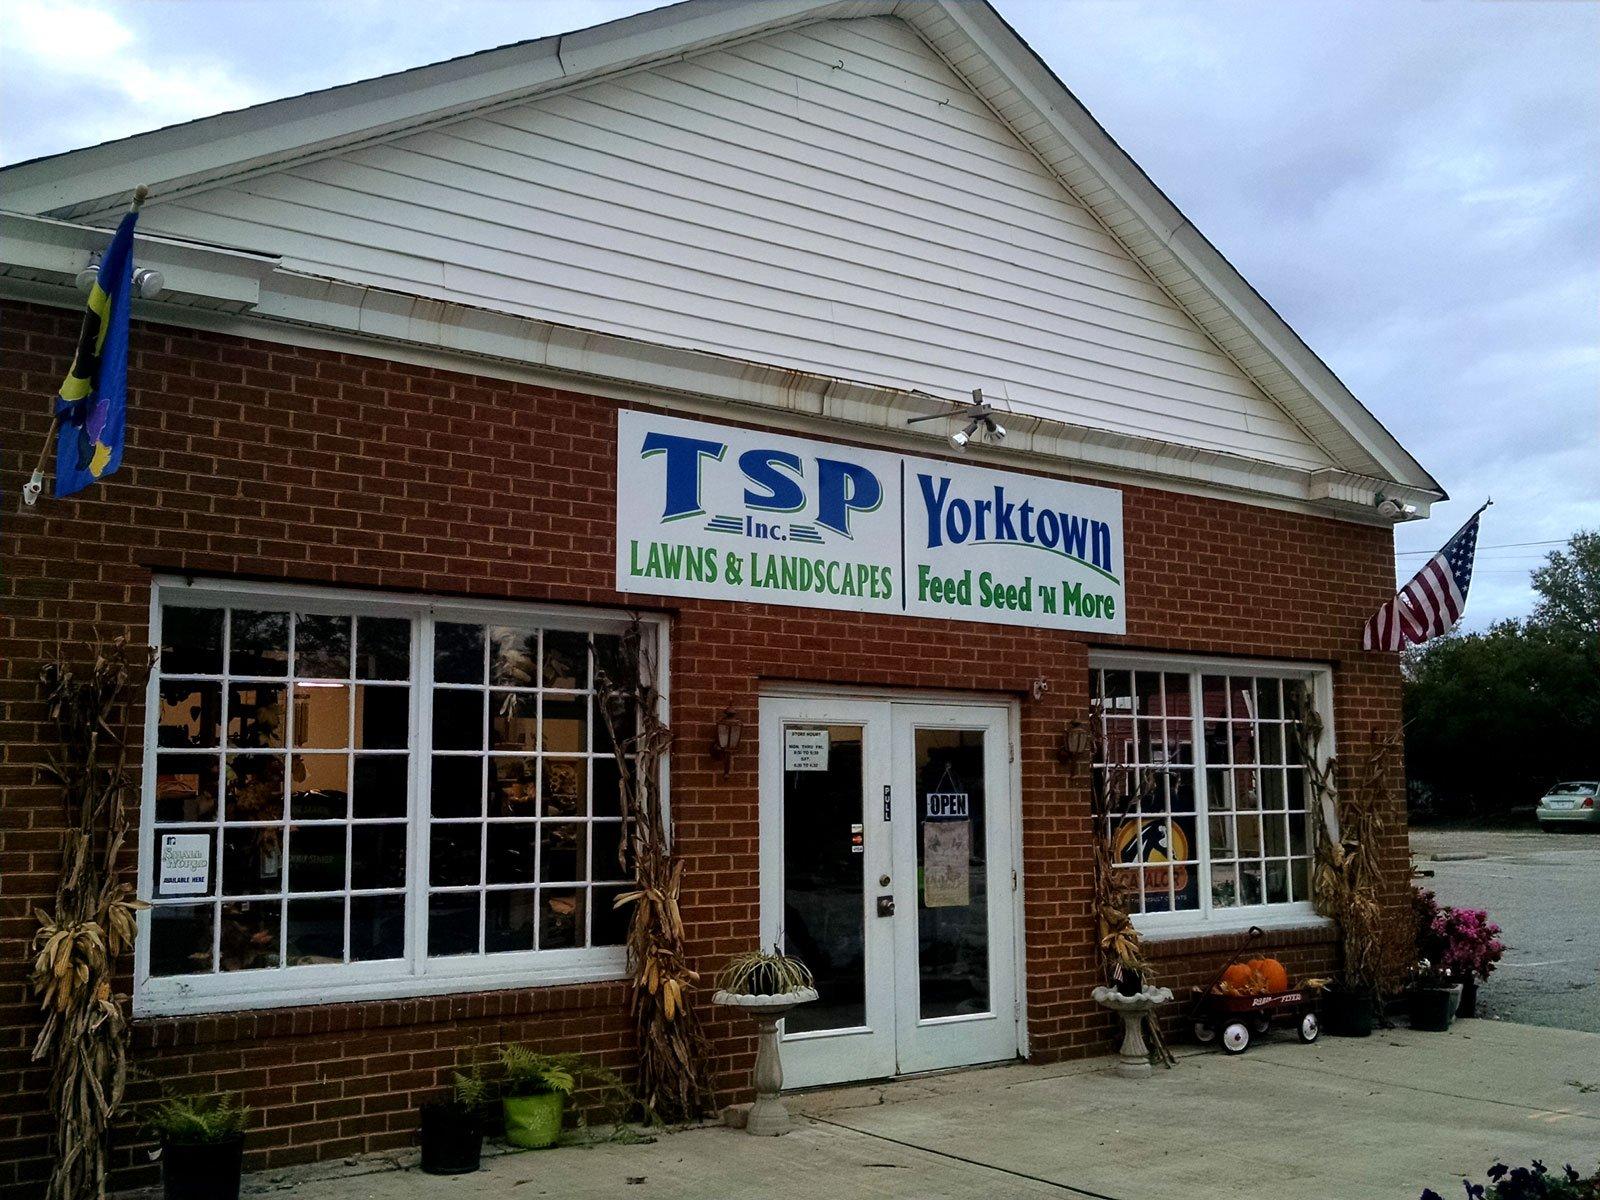 Yorktown Feed & Seed Store - Animal Feed - Bulk Seed